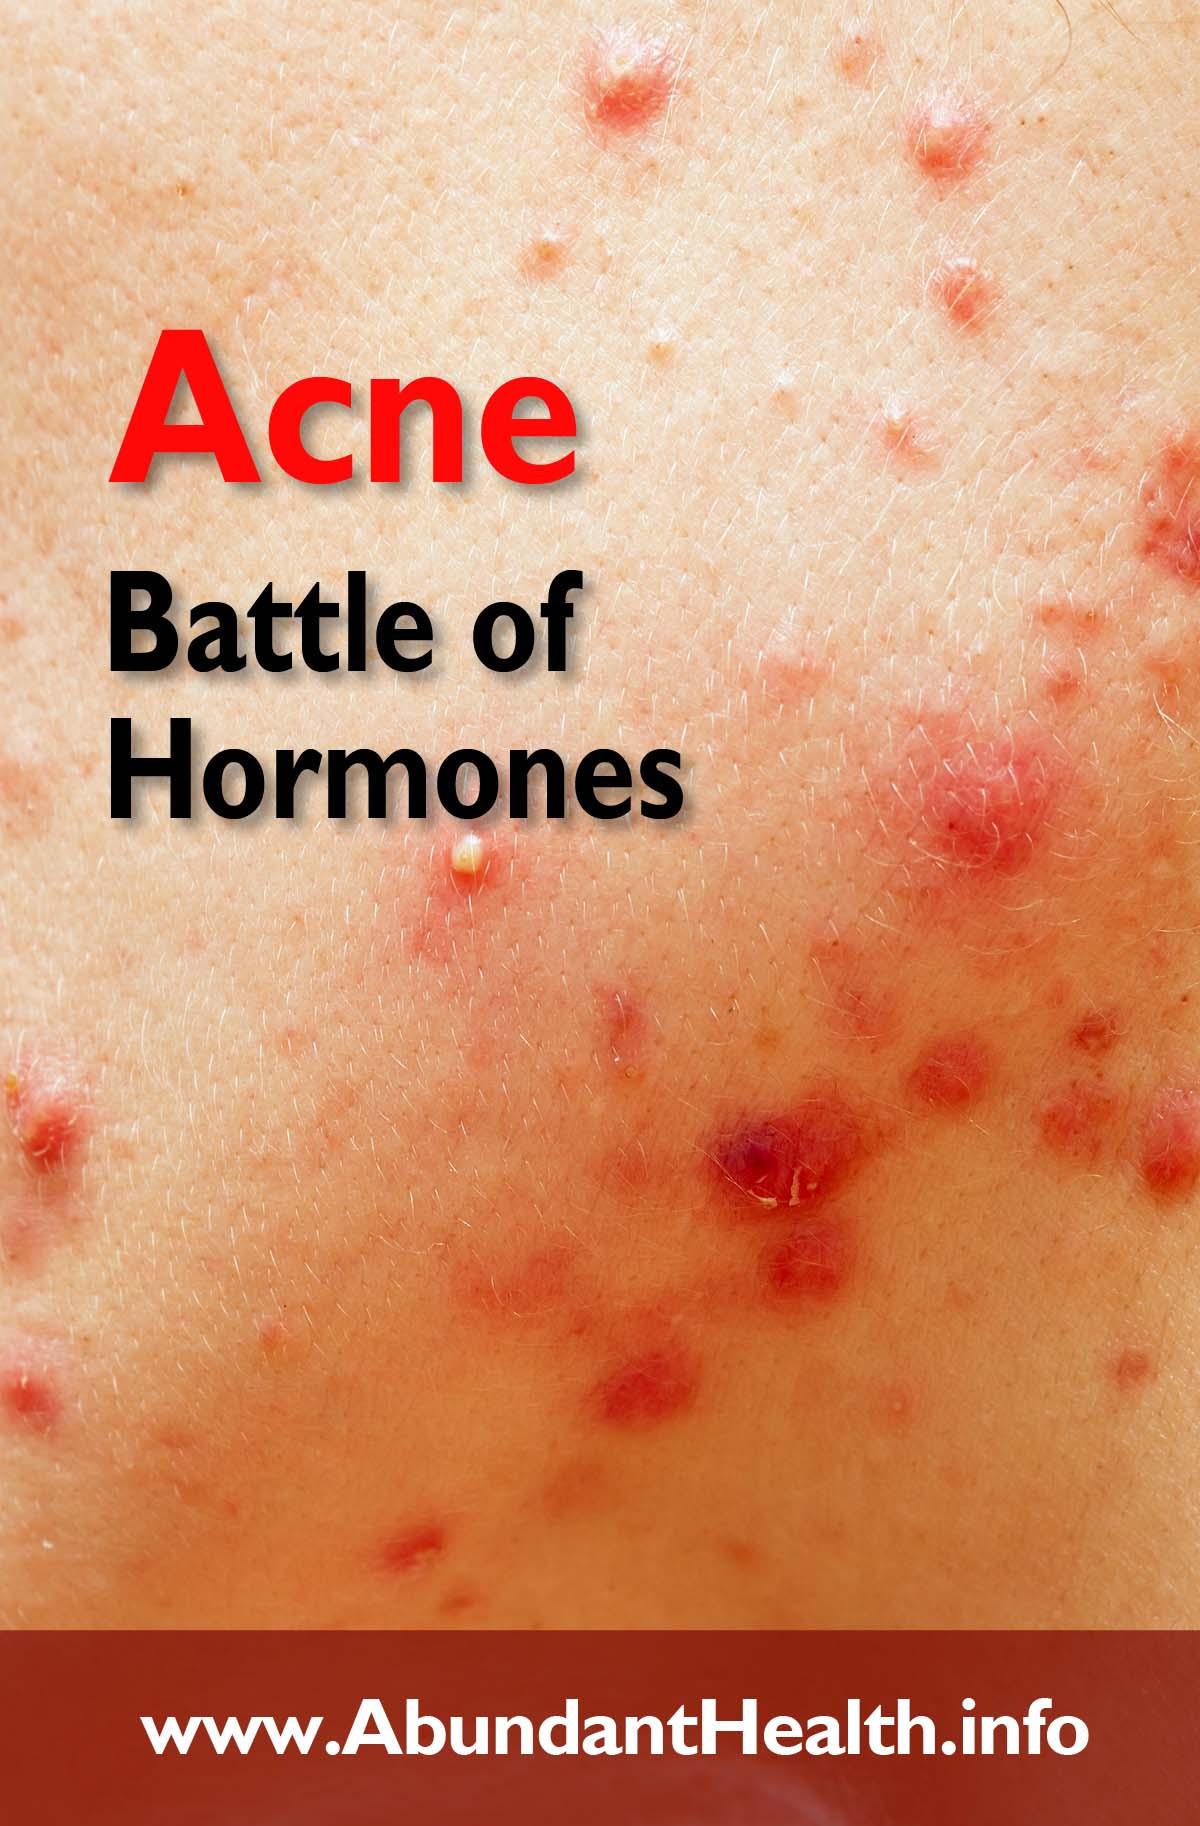 Acne - Battle of Hormones